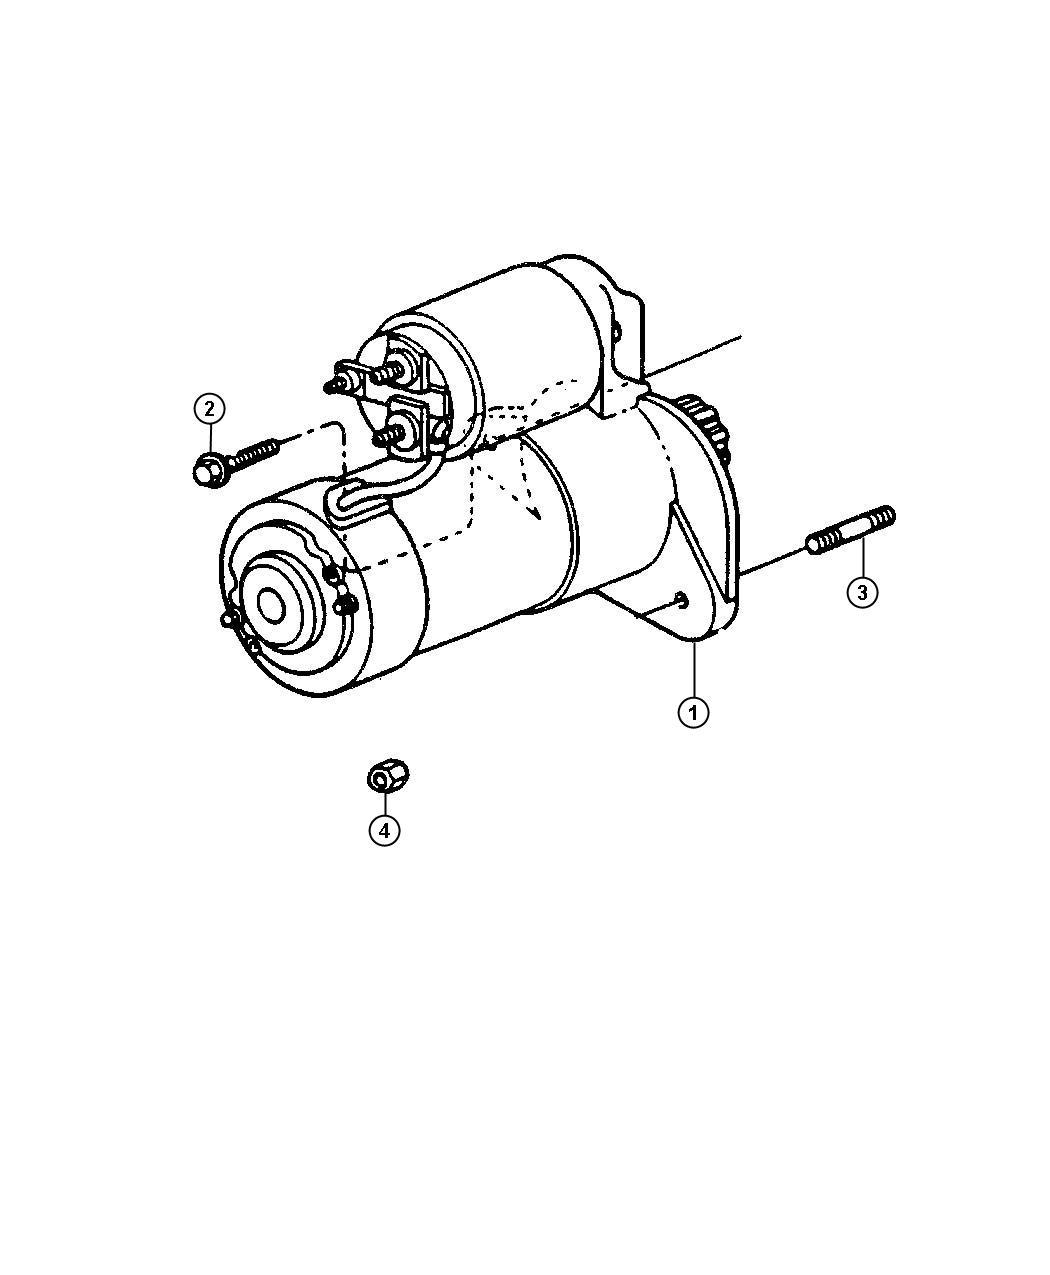 Jeep Wrangler Wiring kit. Jumper. Also comes w/starter